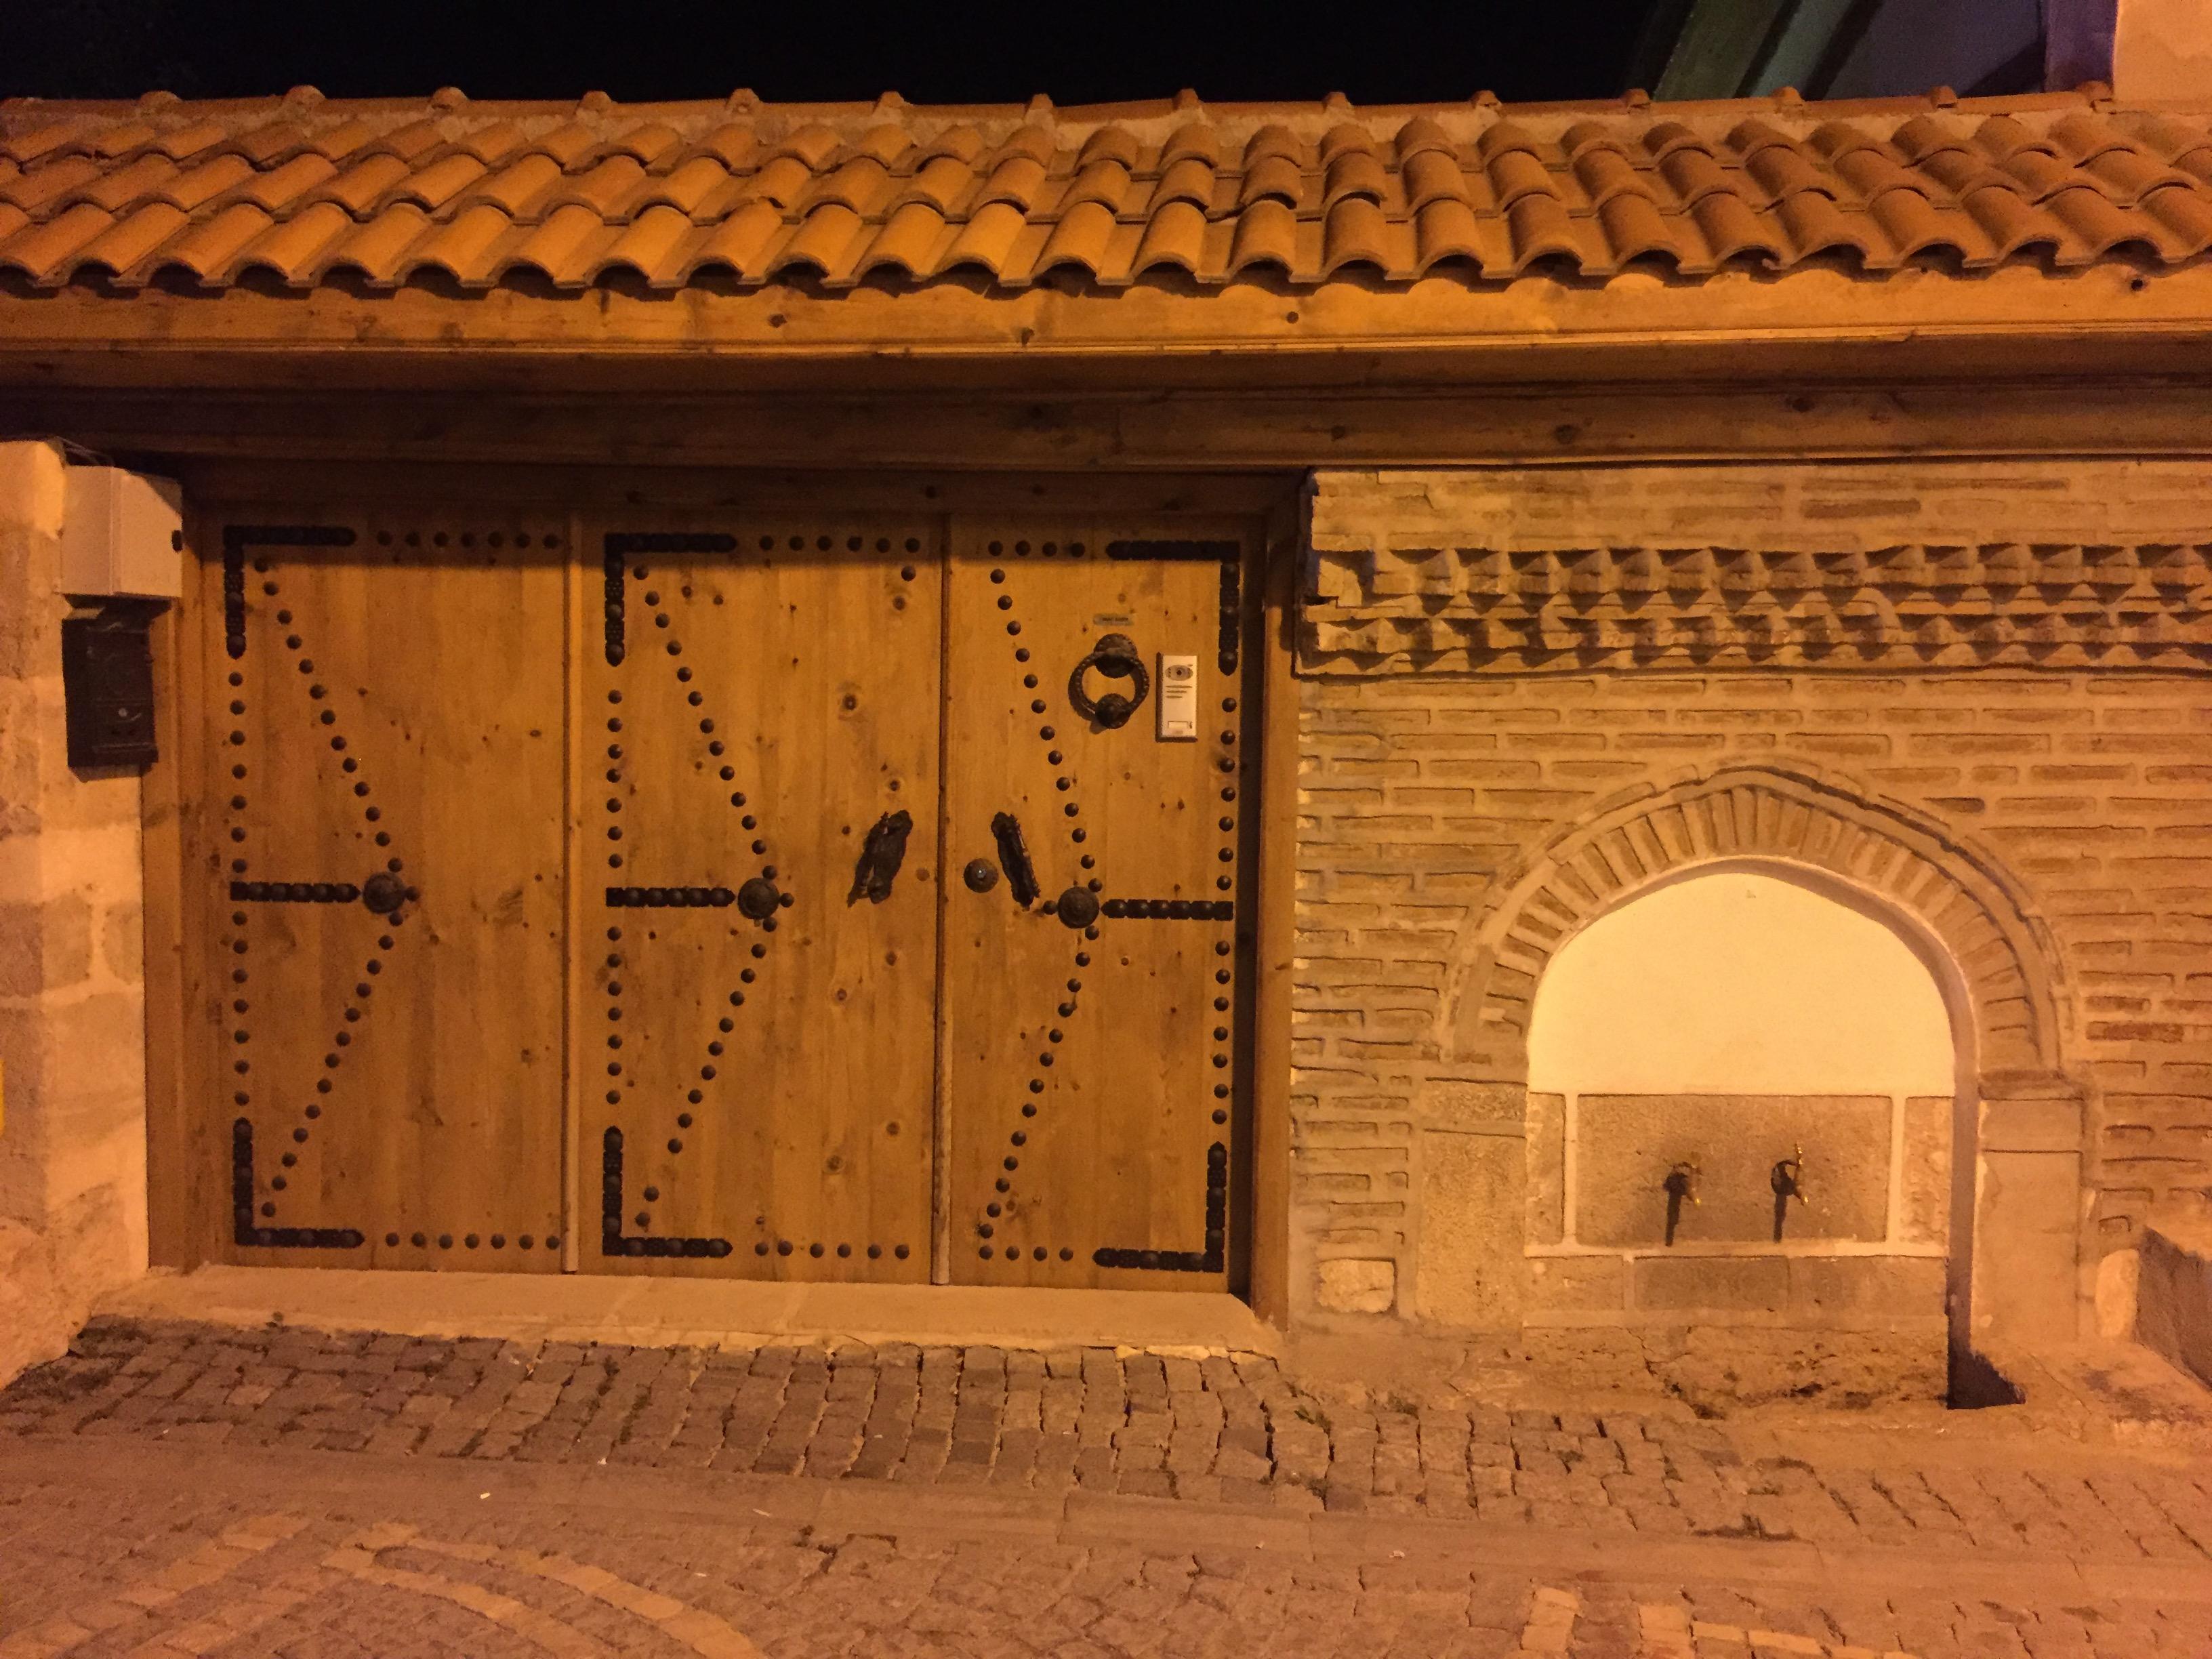 Night-time doorway